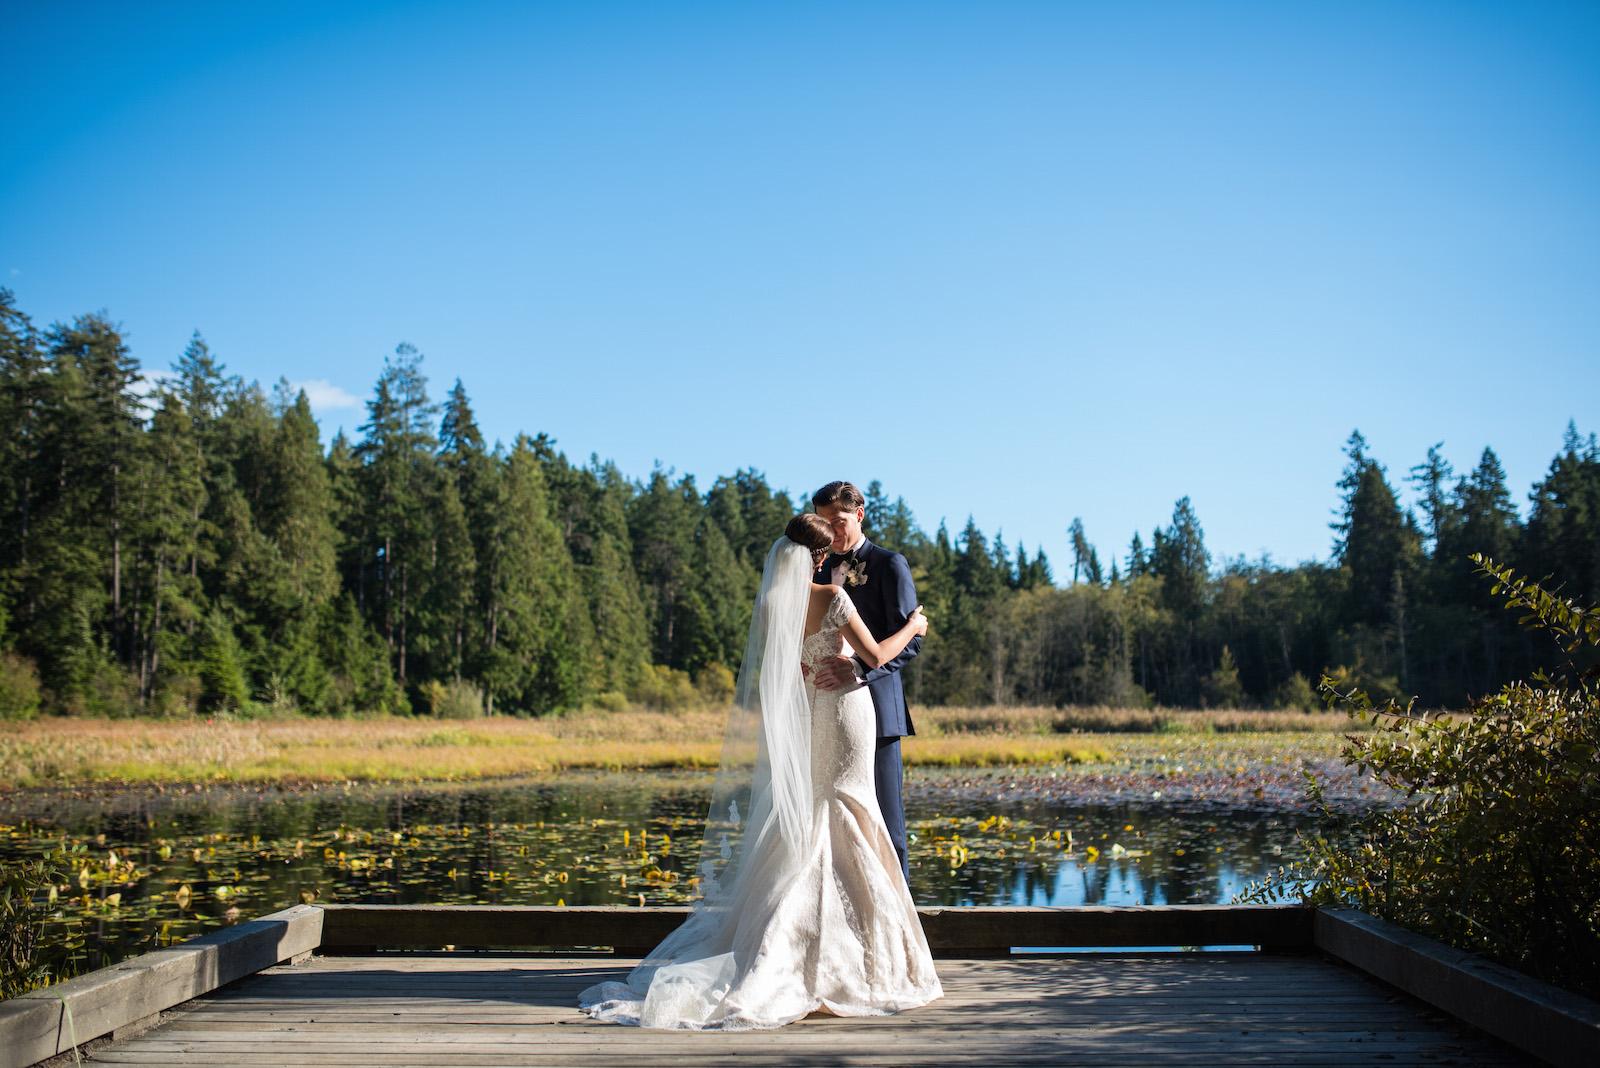 victoria-wedding-photographers-fairmont-pacific-rim-wedding-36.jpg